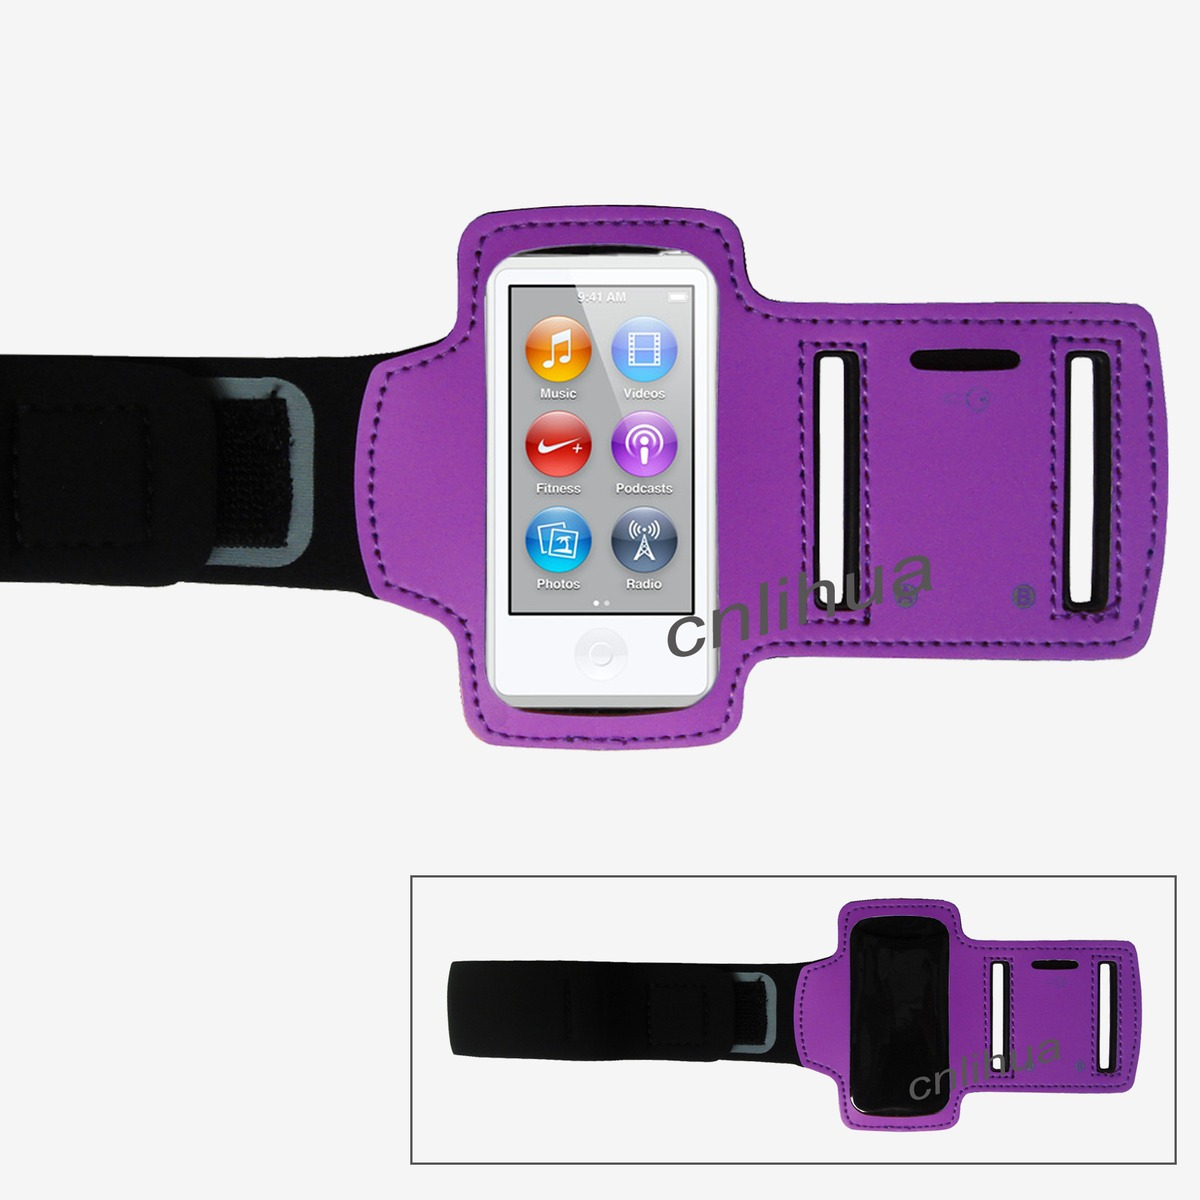 purple sports armband workout running holder case for ipod. Black Bedroom Furniture Sets. Home Design Ideas